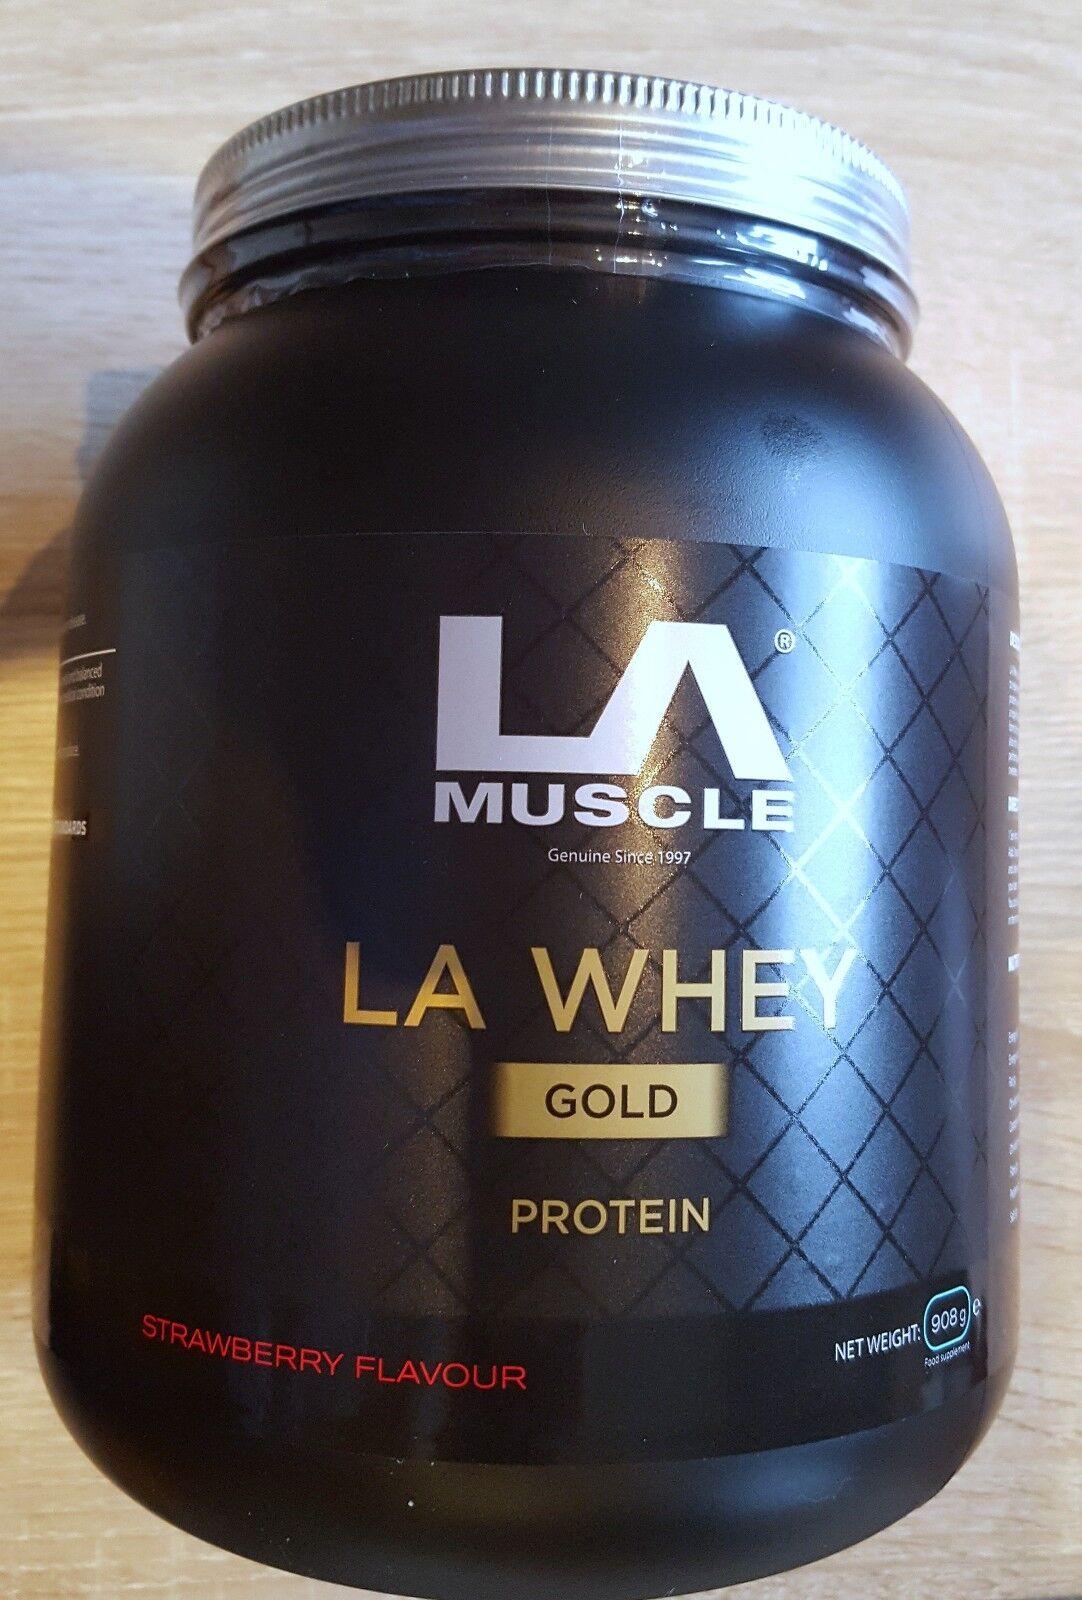 LA Muscle LA Whey GOLD Protein - 908g 908g - Strawberry Flavour - Brand New Sealed Tub a80e06